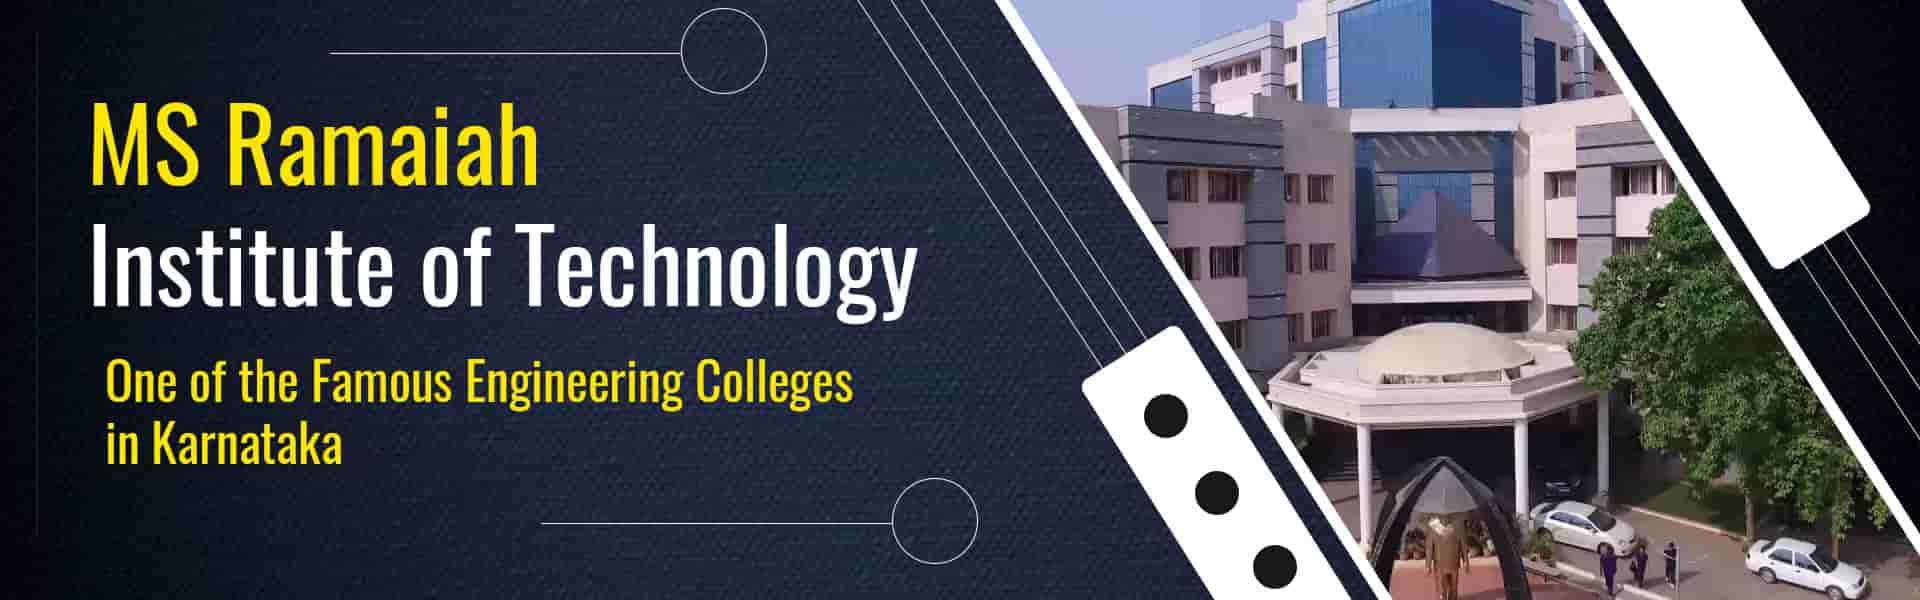 MS Ramaiah Institute of Technology MSRIT Bangalore